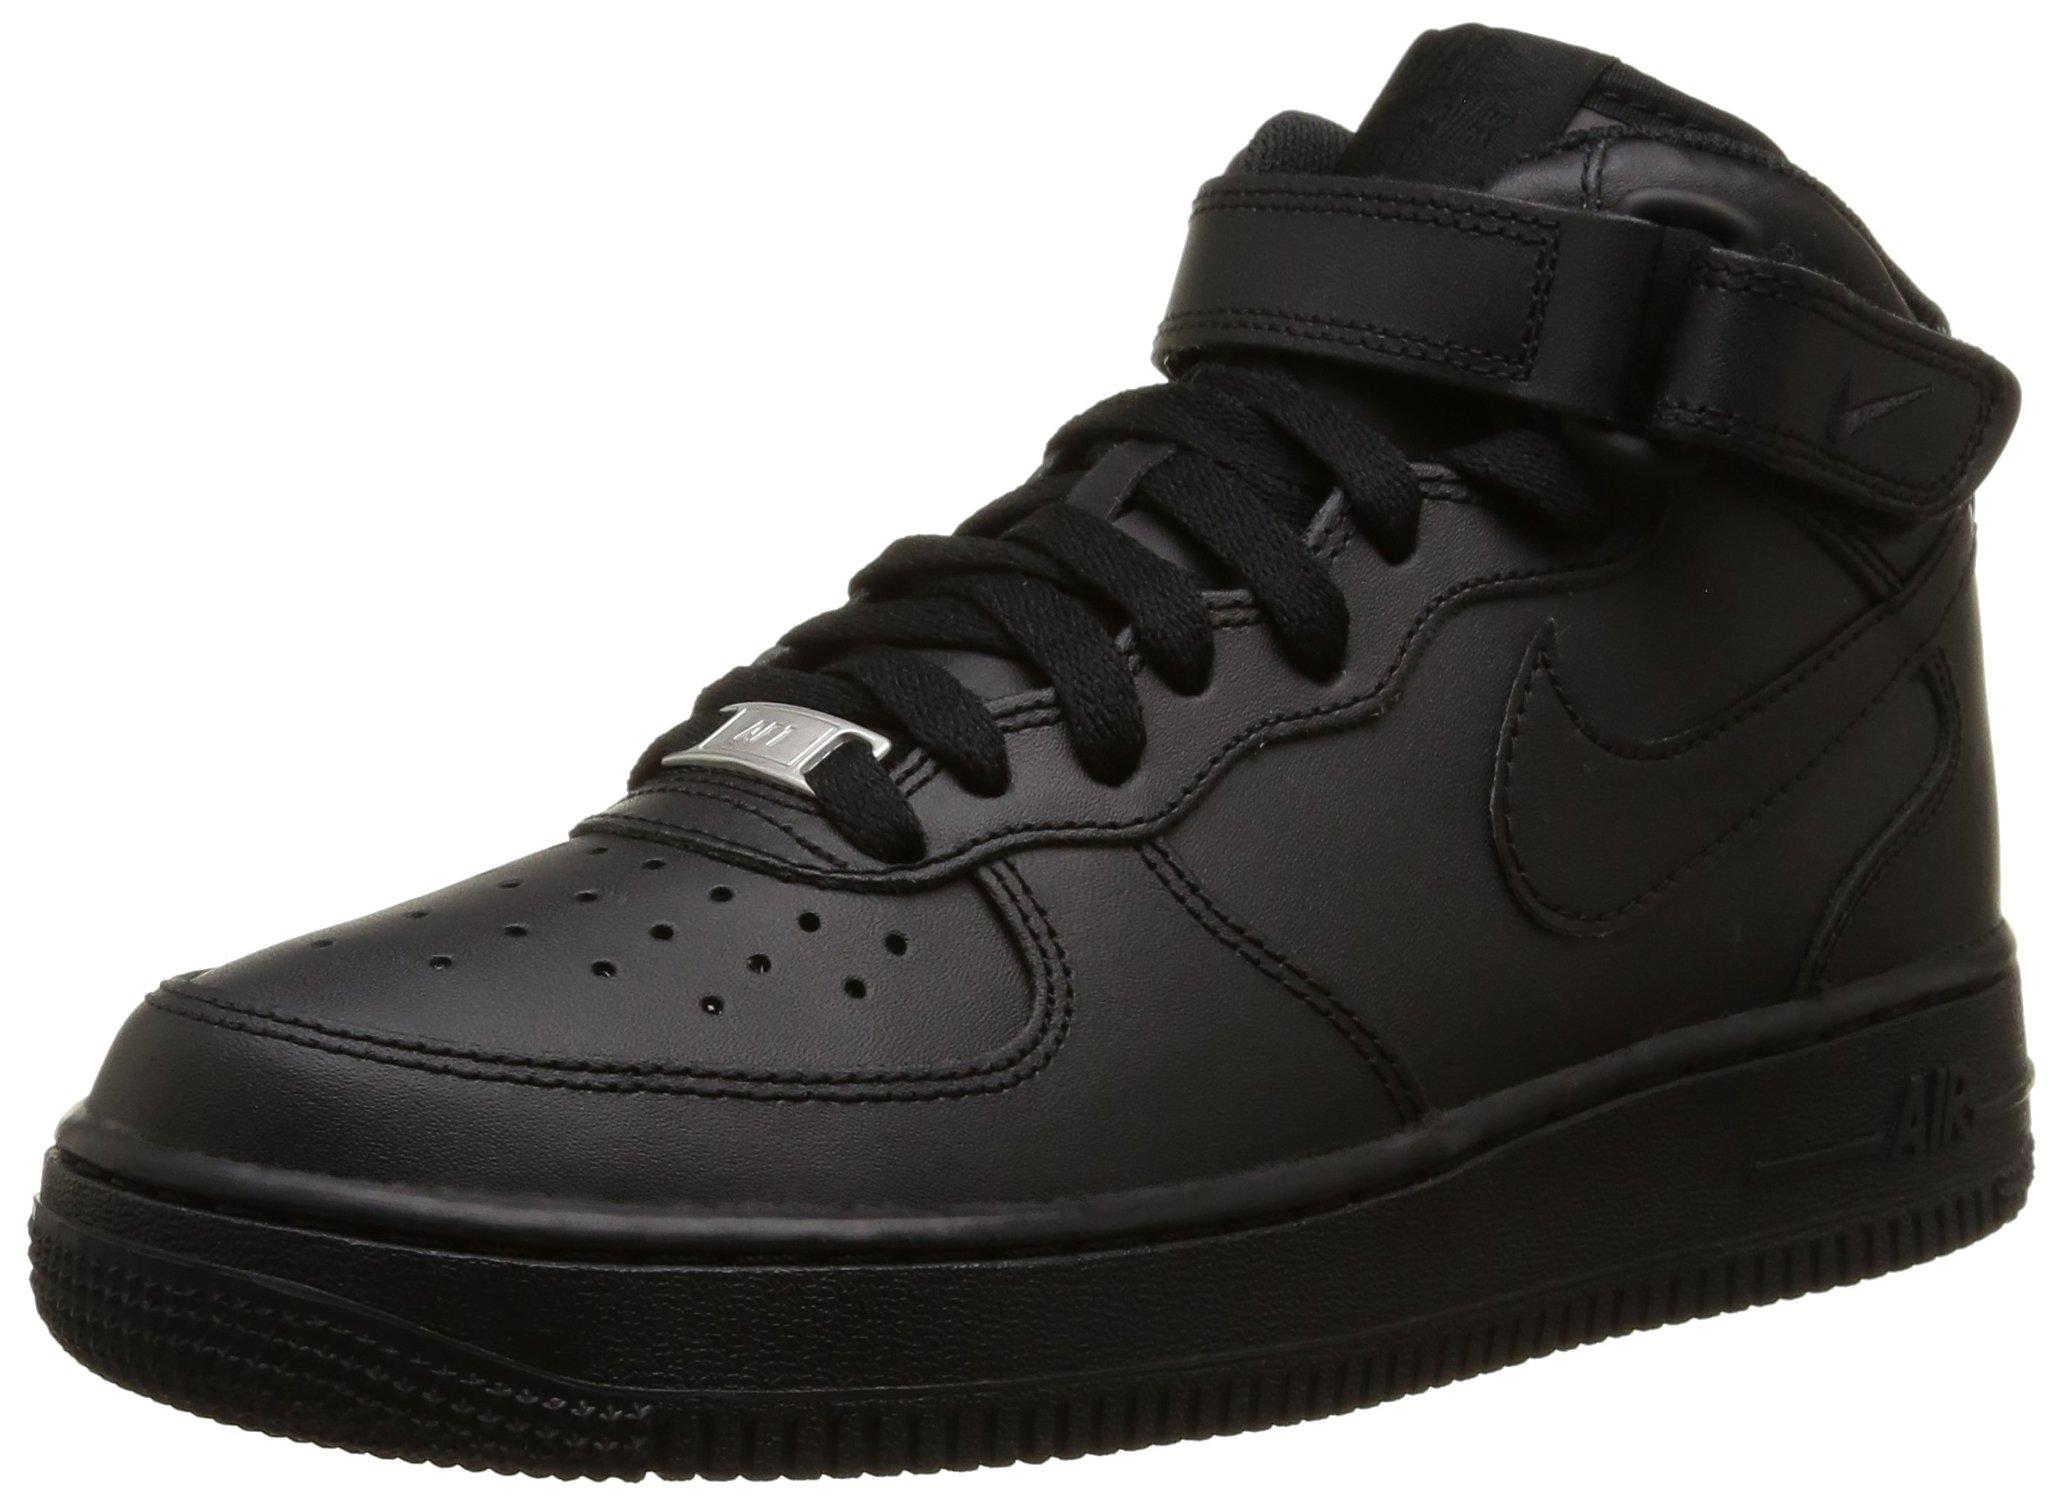 Nike Air Force 1 (Gs) - Scarpe Sportive da Bambini E Ragazzi product image 81b9edd5866